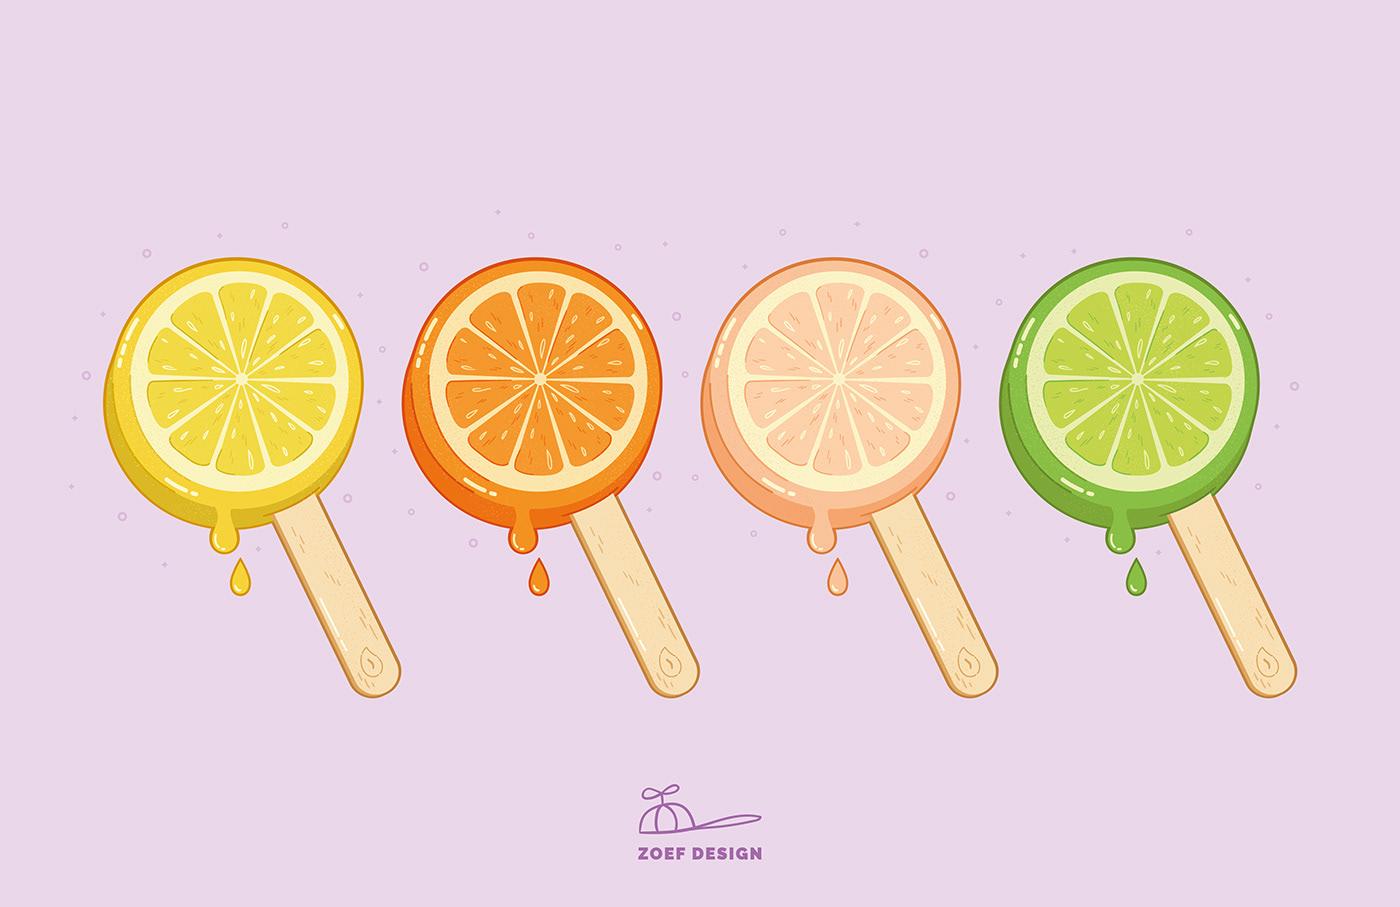 citrusfruits,fabric print,icecream,Illustrator,popsicle,summer pattern design,vector